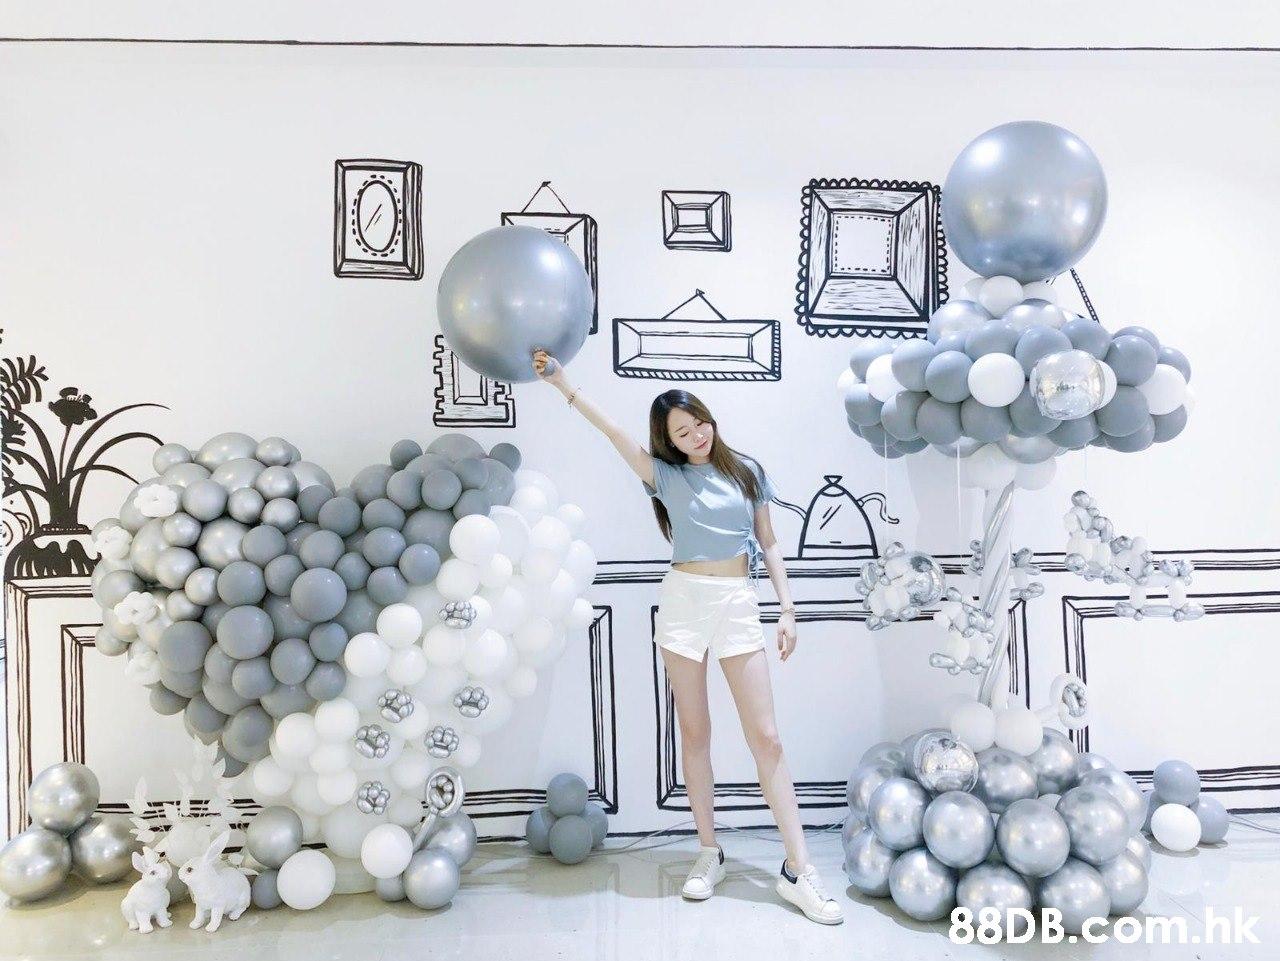 .hk  Balloon,White,Party supply,Architecture,Silver